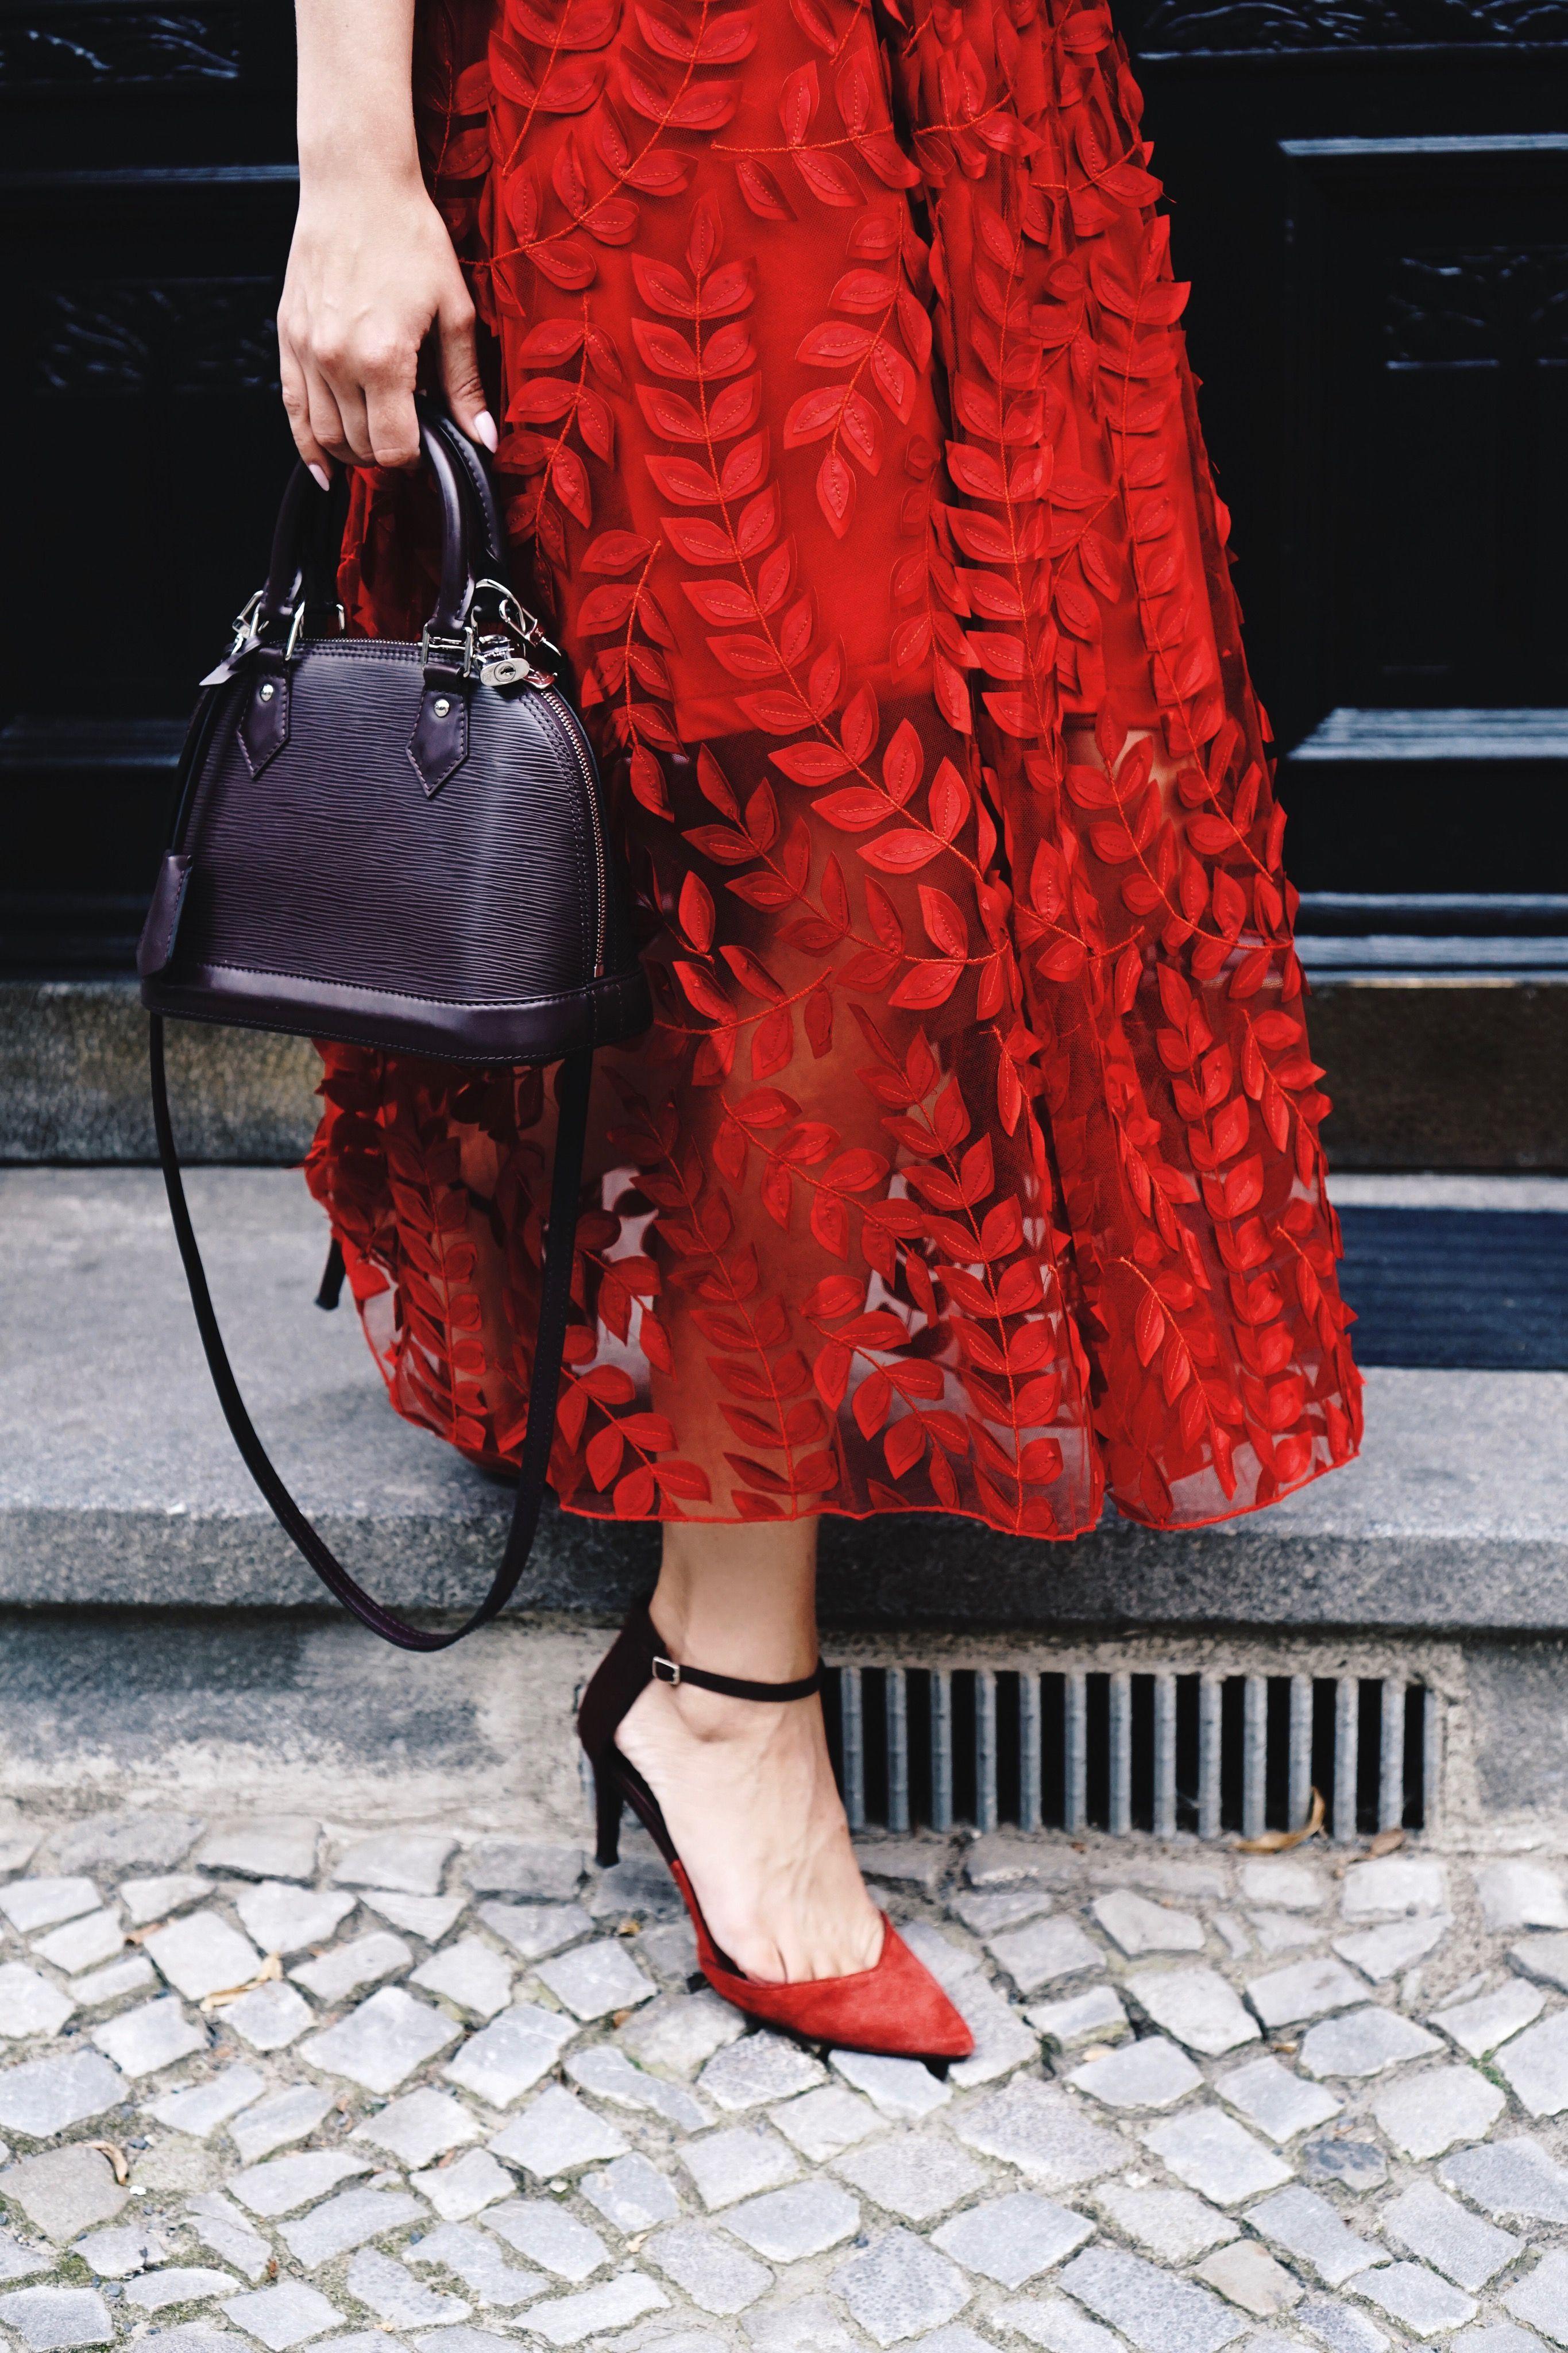 ea11bcdd28b OOTD - H&M skirt, Zara pumps, Louis Vuitton Alma bb bag. www.louisa ...